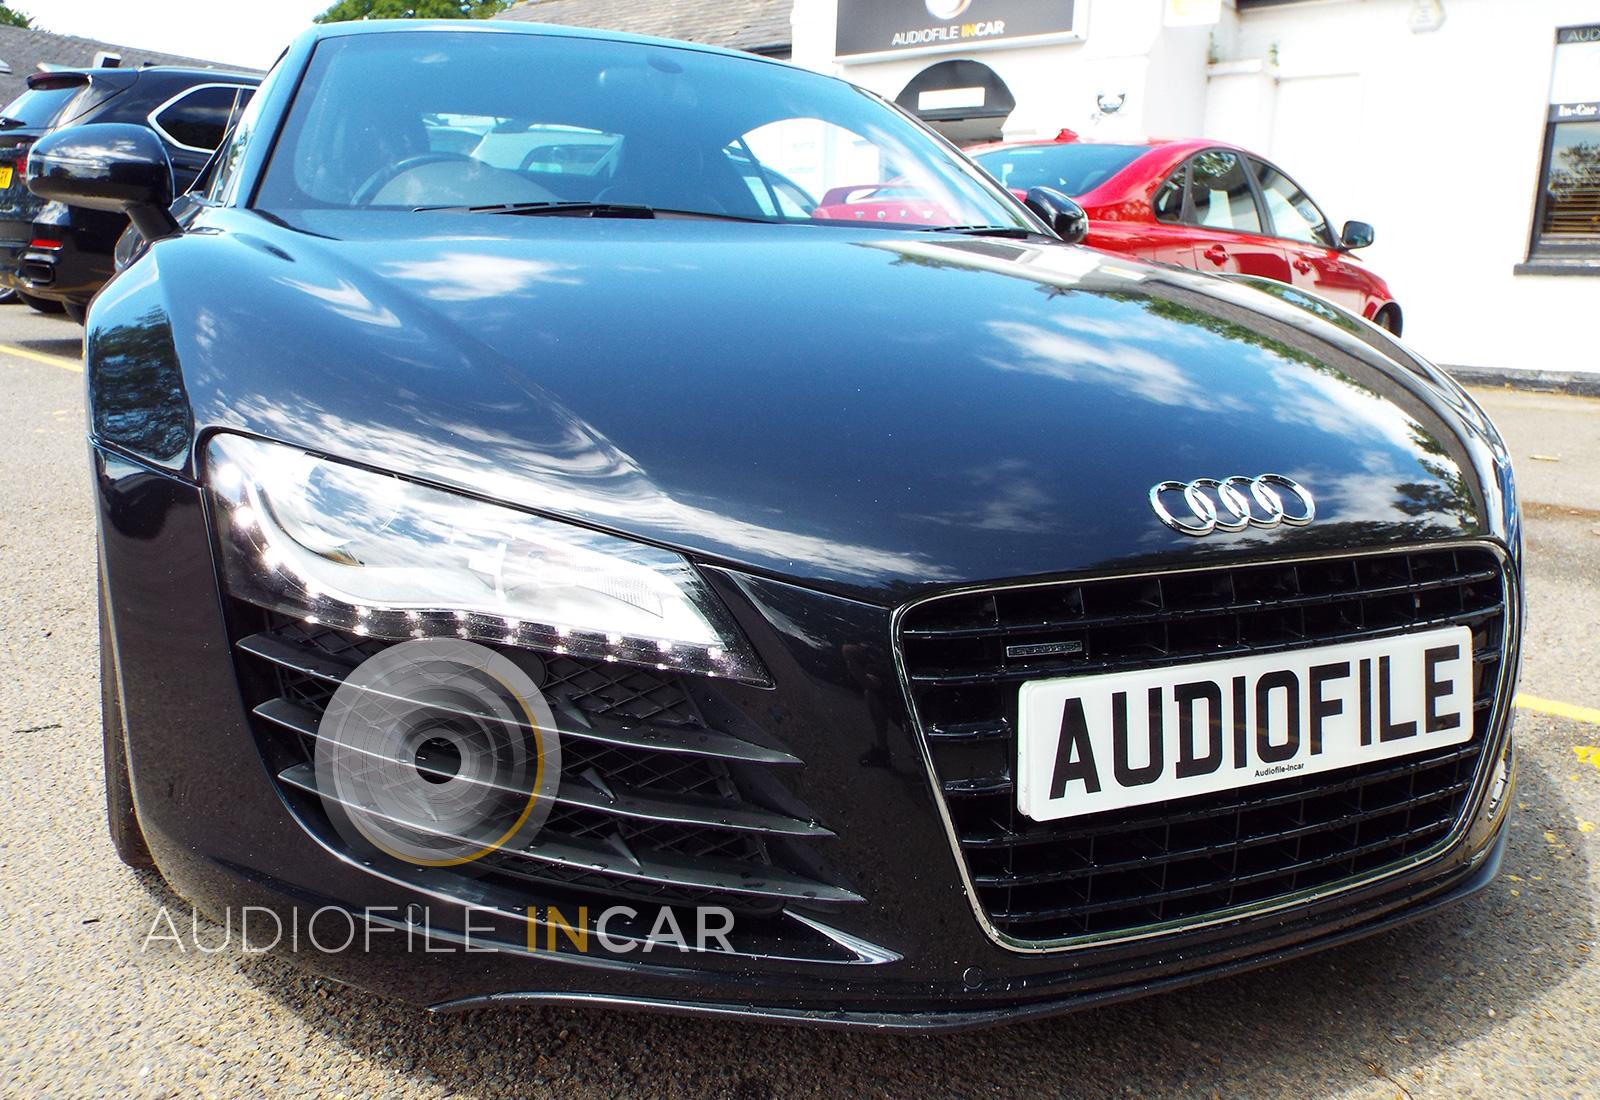 Audi Navigation System Vehicle : Audi r sat nav upgrades